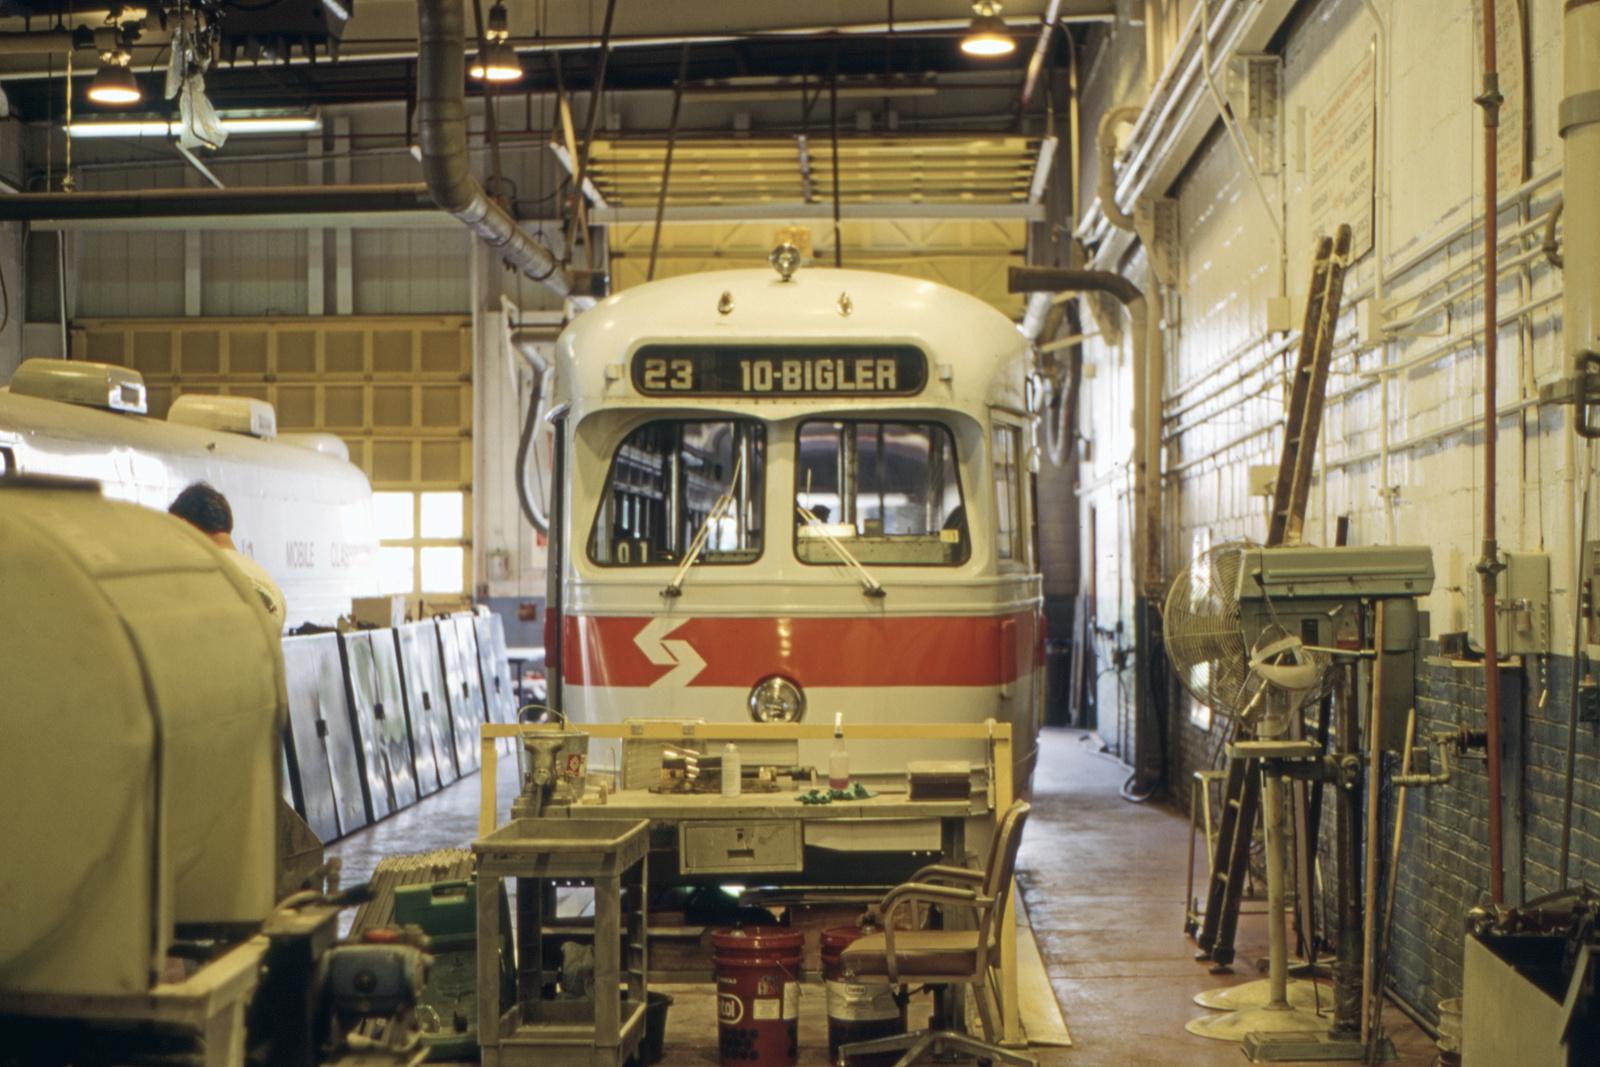 (658k, 1600x1067)<br><b>Country:</b> United States<br><b>City:</b> Philadelphia, PA<br><b>System:</b> SEPTA (or Predecessor)<br><b>Line:</b> Rt. 23-Germantown<br><b>Location:</b> Germantown Depot<br><b>Car:</b> PTC/SEPTA Postwar All-electric PCC (St.Louis, 1948) 2182 <br><b>Collection of:</b> David Pirmann<br><b>Date:</b> 5/15/1995<br><b>Viewed (this week/total):</b> 0 / 51